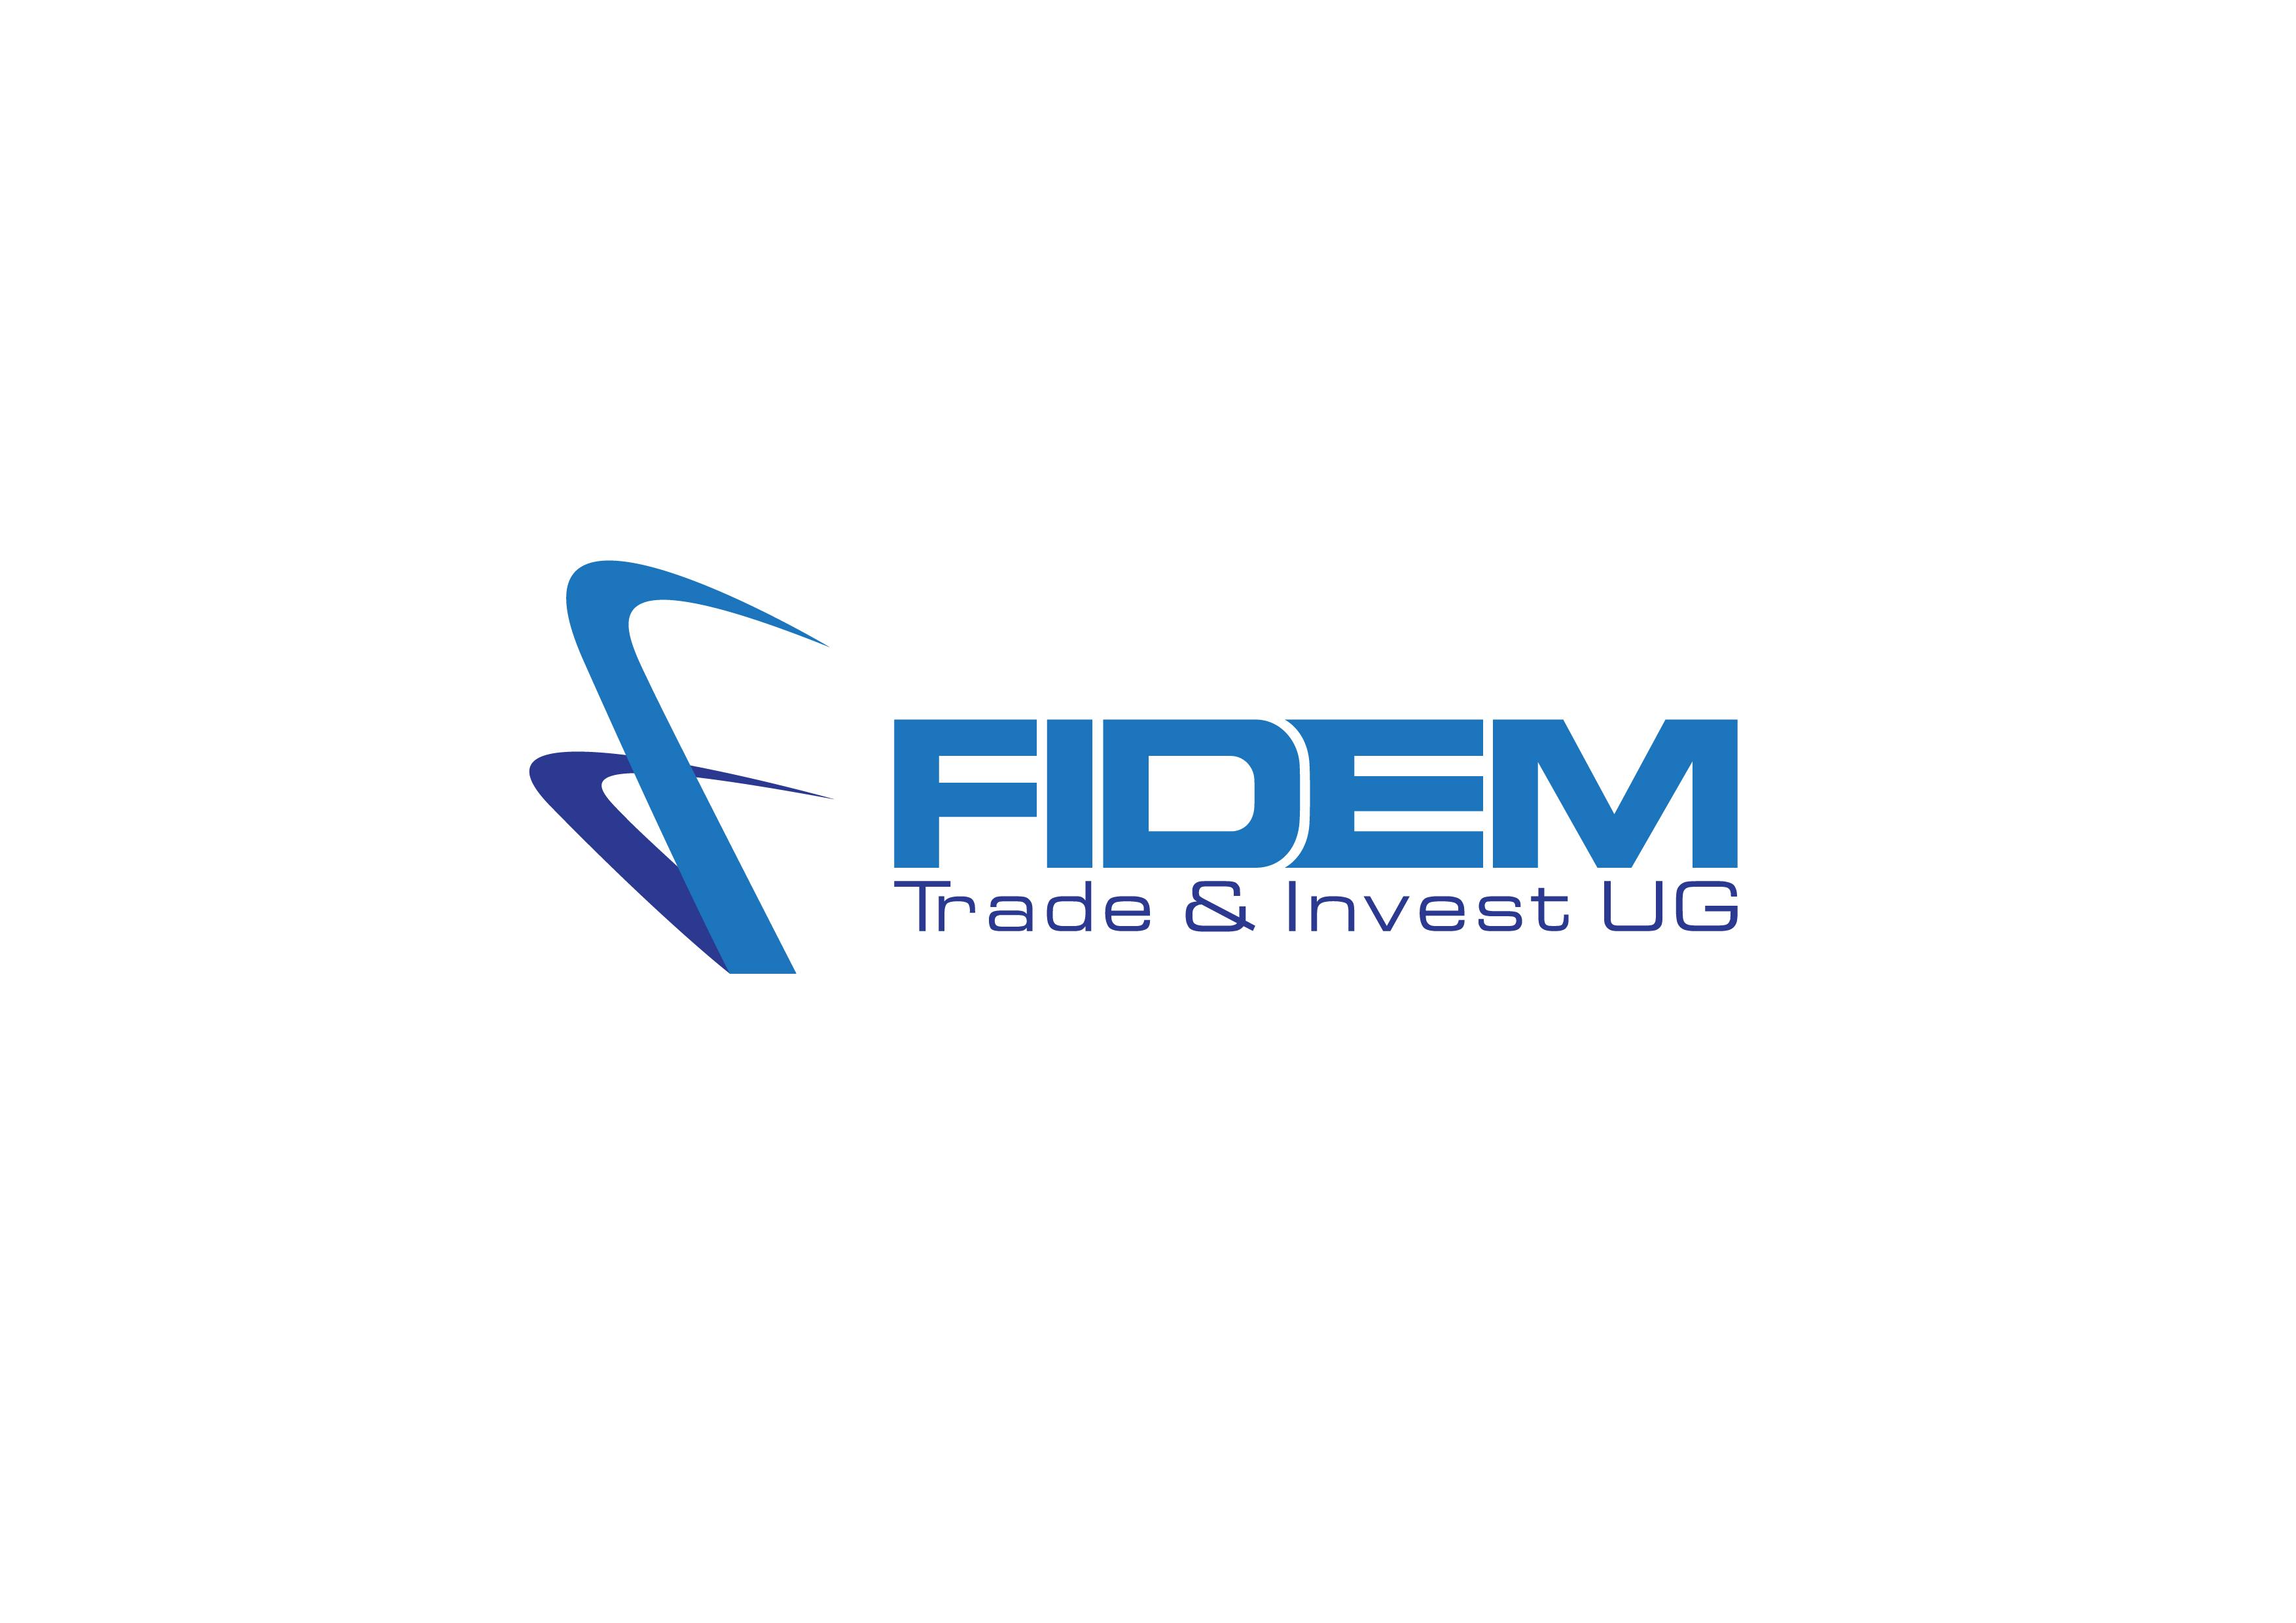 Logo Design by 3draw - Entry No. 704 in the Logo Design Contest Professional Logo Design for FIDEM Trade & Invest UG.